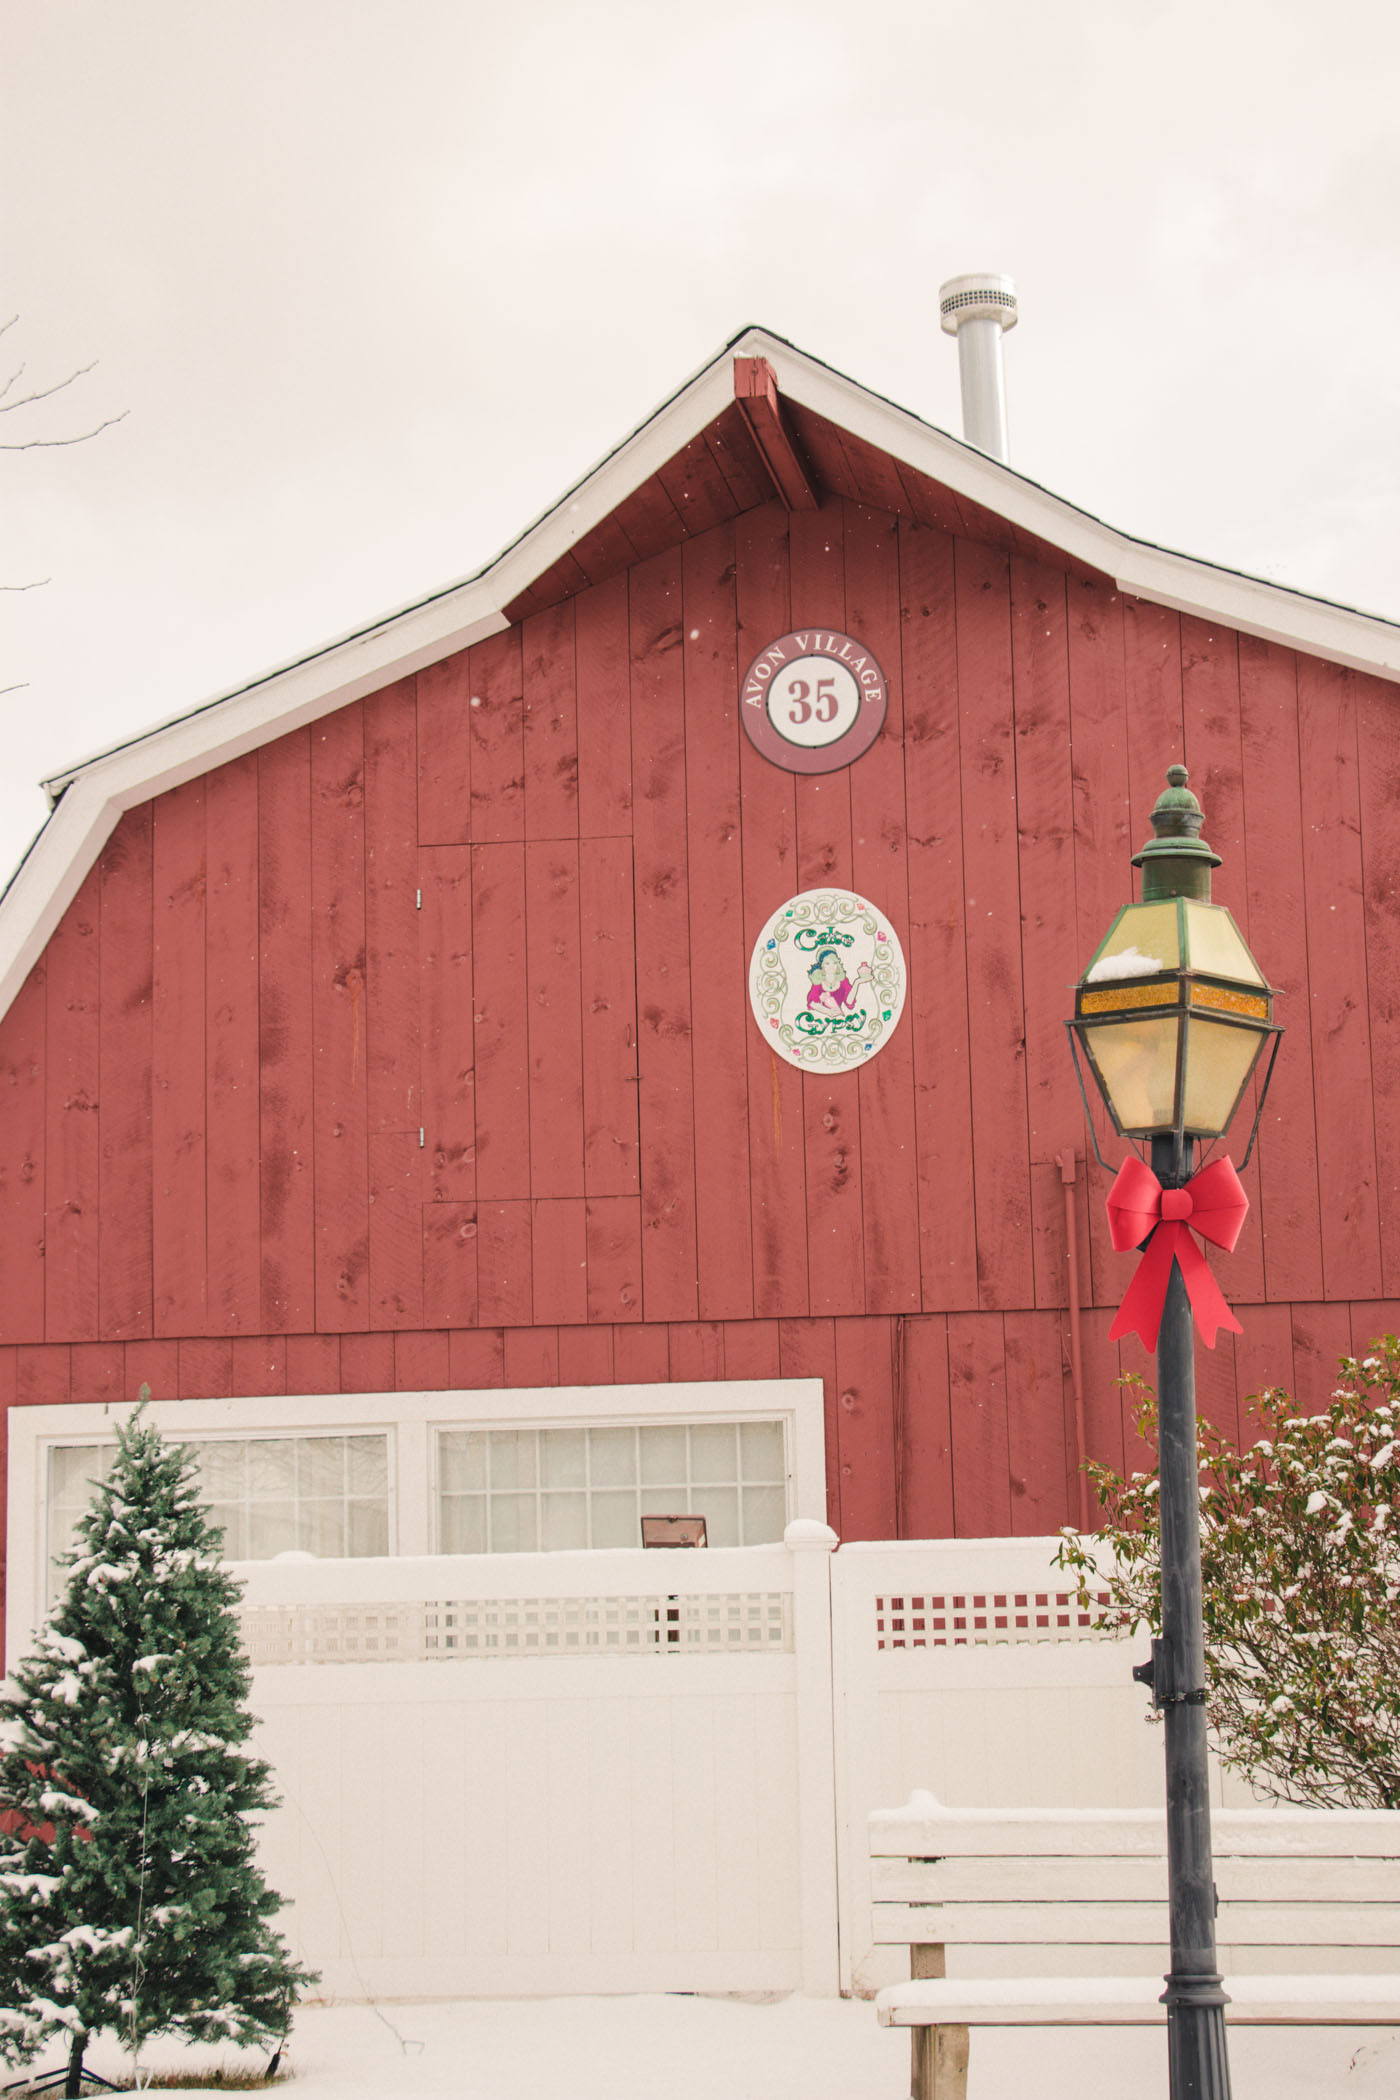 Avon Village Marketplace Barn in Connecticut